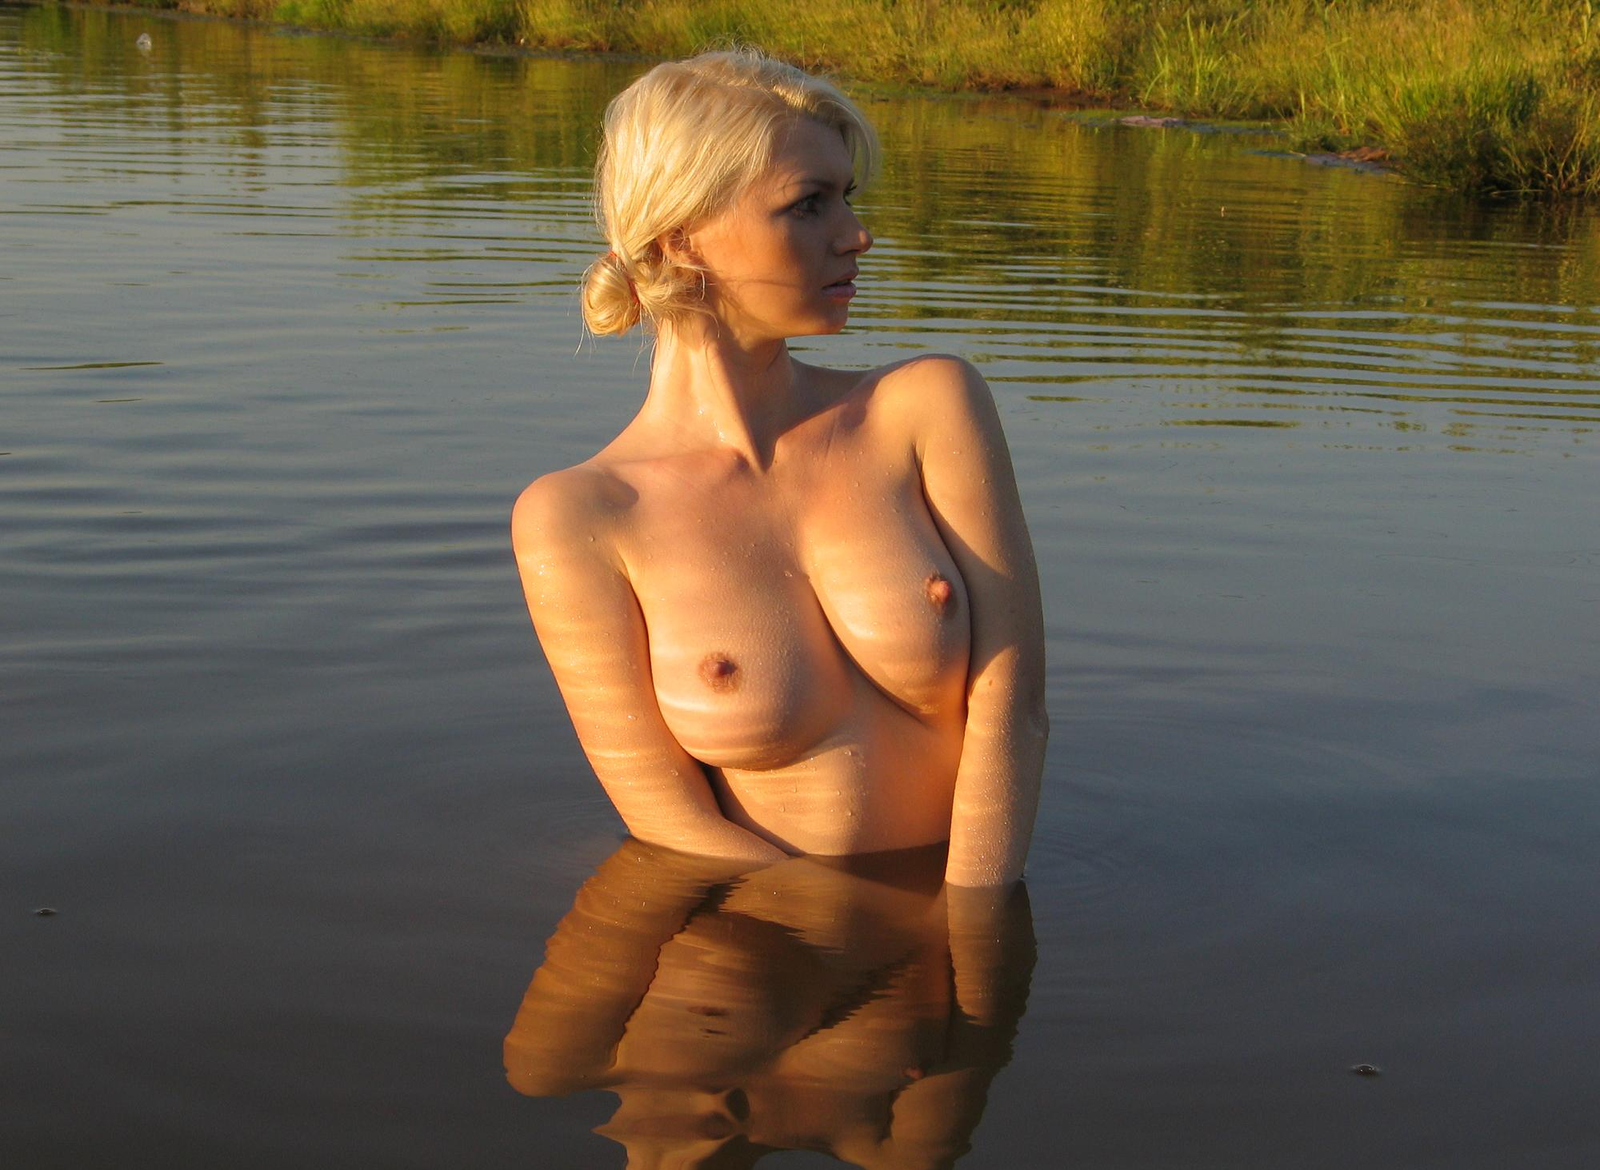 Жена дому фото сиськи на пруду спящих